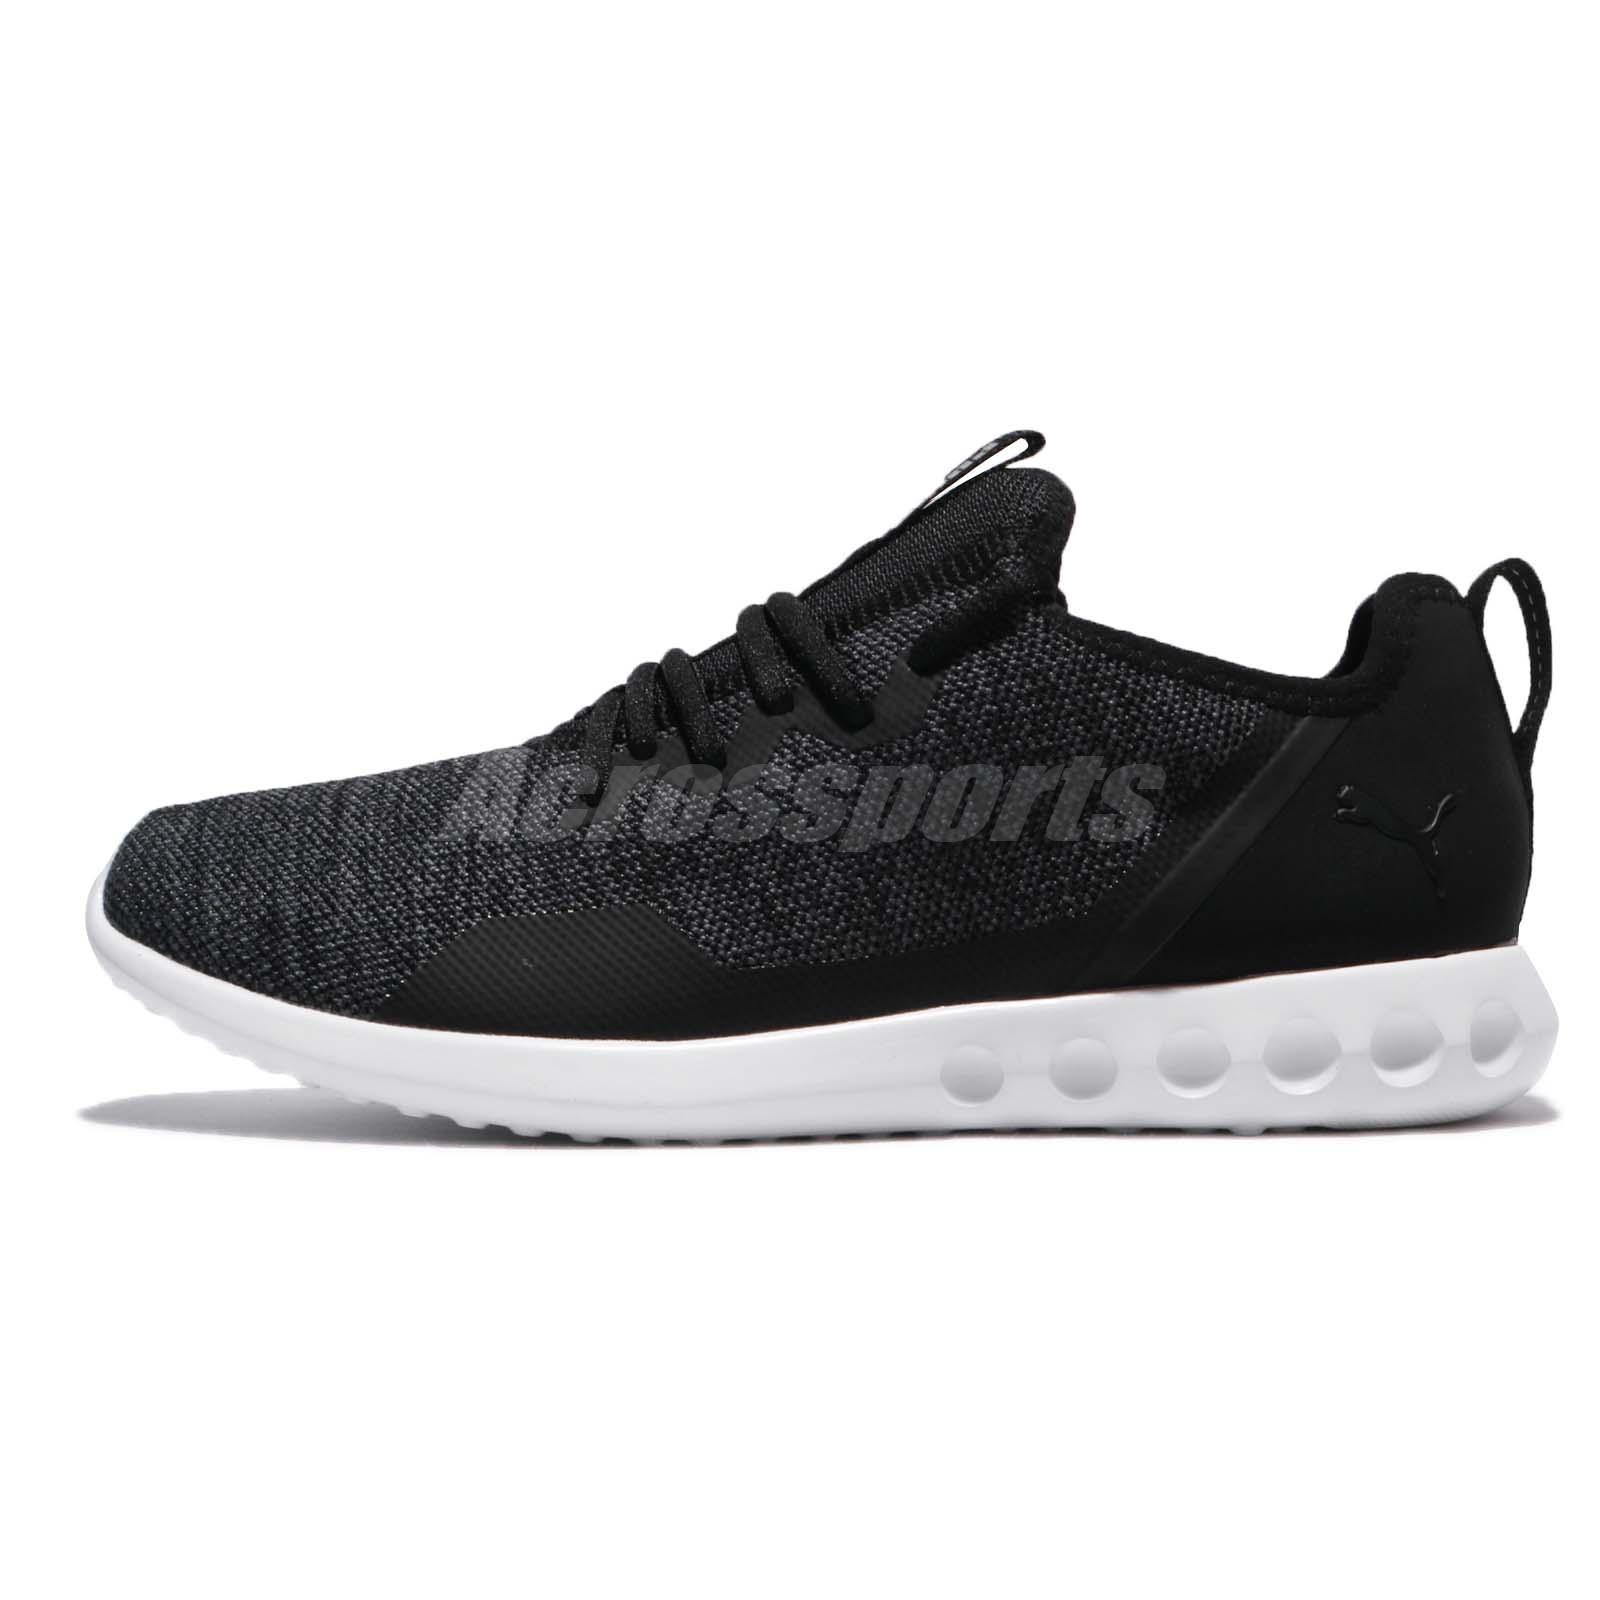 e9a82a2f3821 Puma Carson 2 X Knit Black Asphalt Men Running Casual Shoes Sneakers  190966-01